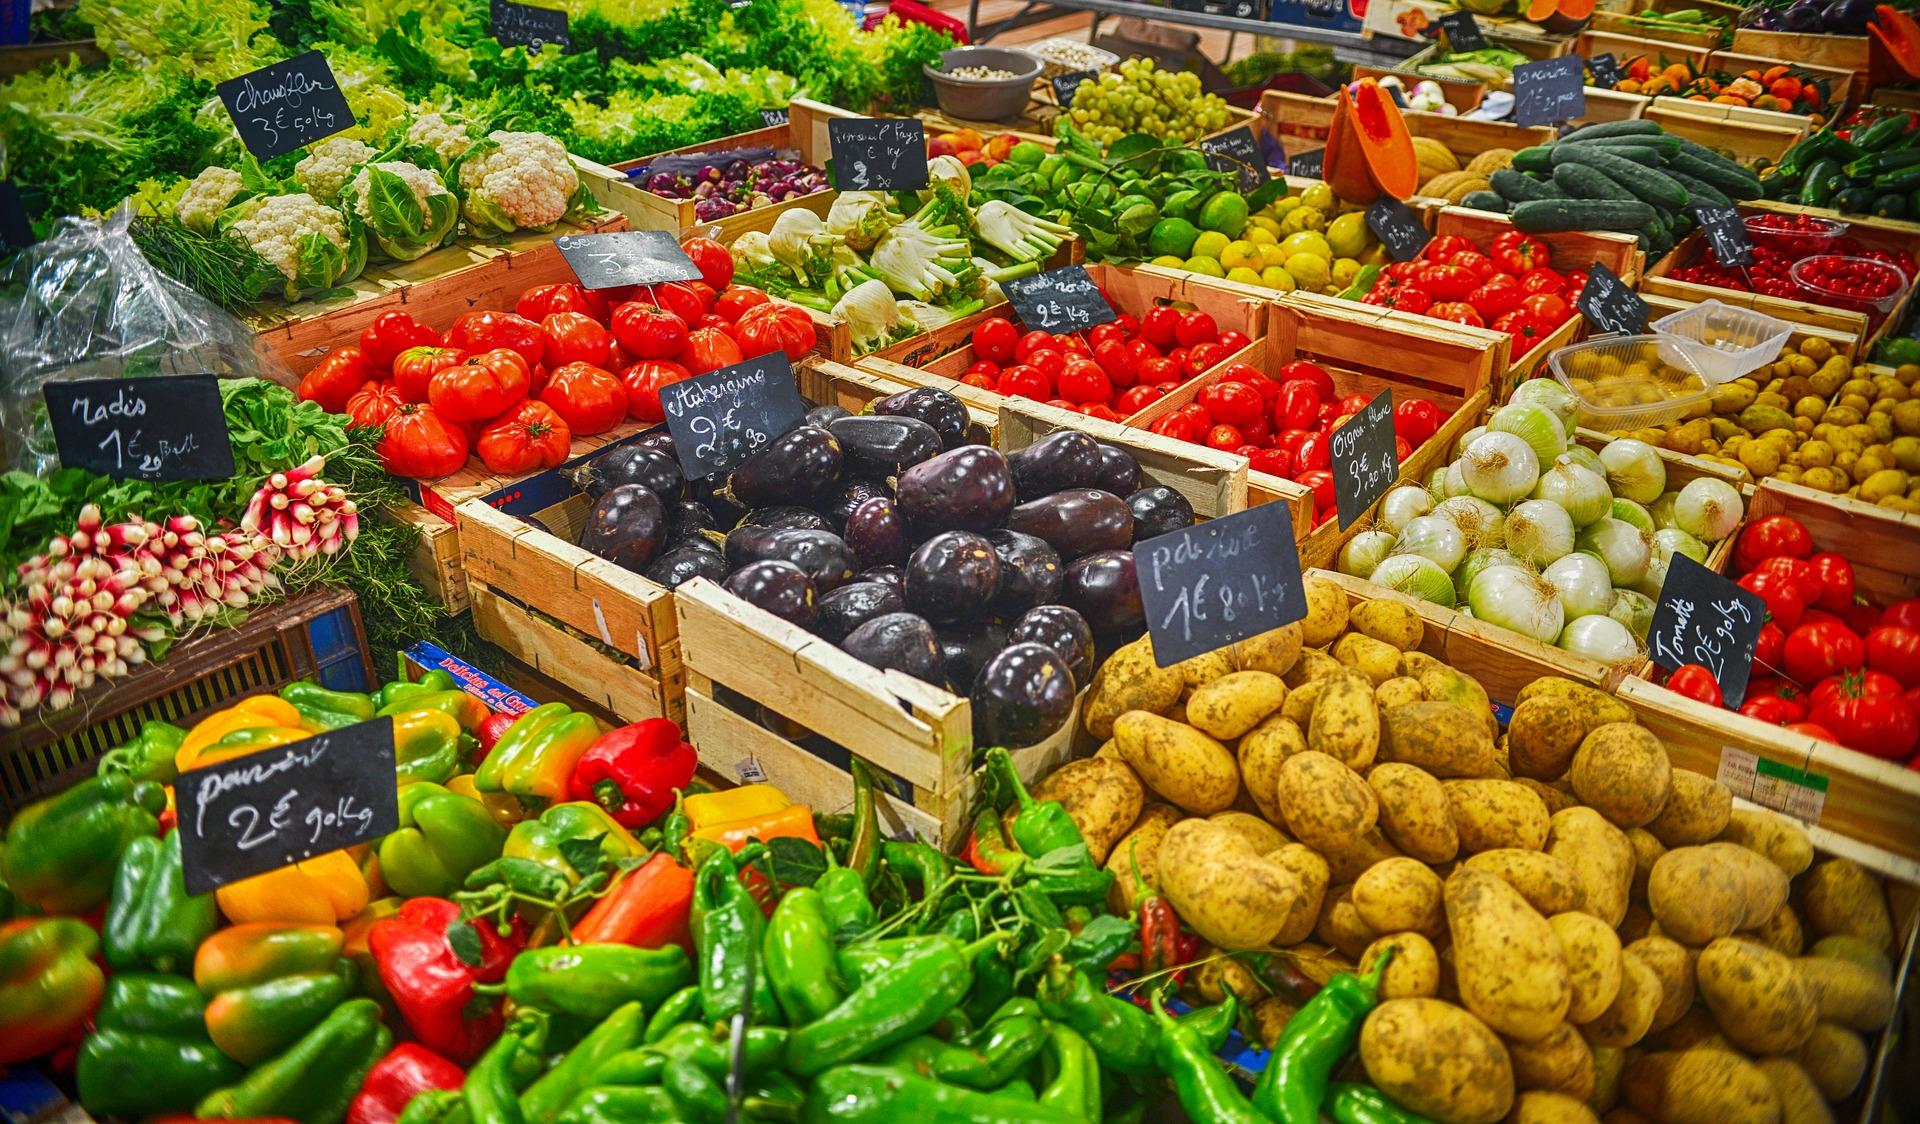 vegetables-2464832_1920.jpg